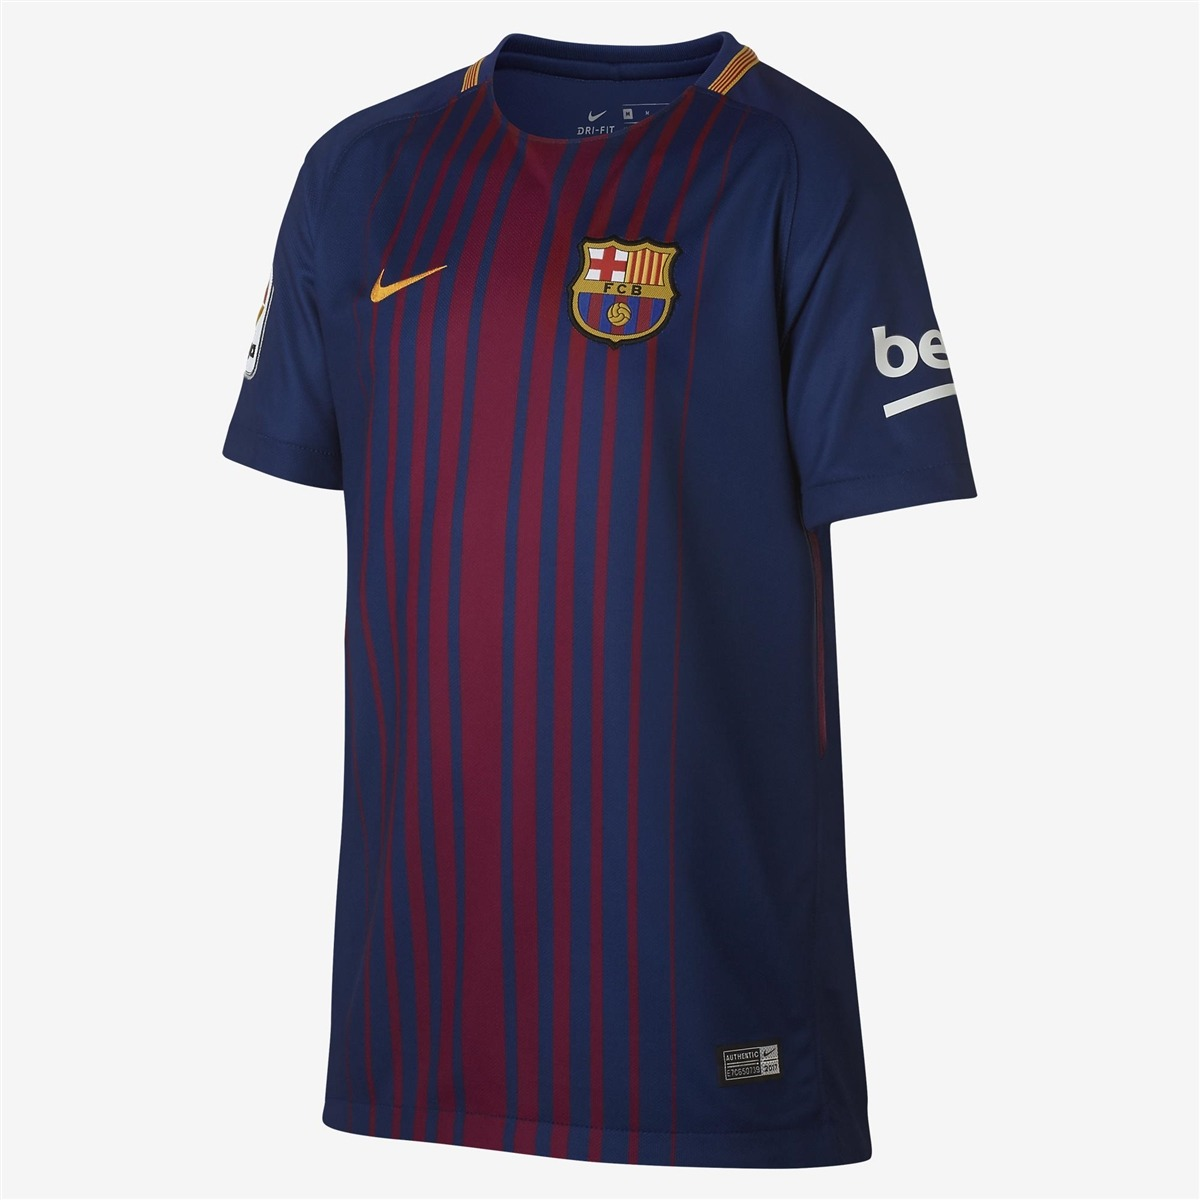 camisa nike fcb barcelona uniforme 1 torcedor 17 18 infantil. Carregando  zoom. 5e28761d115